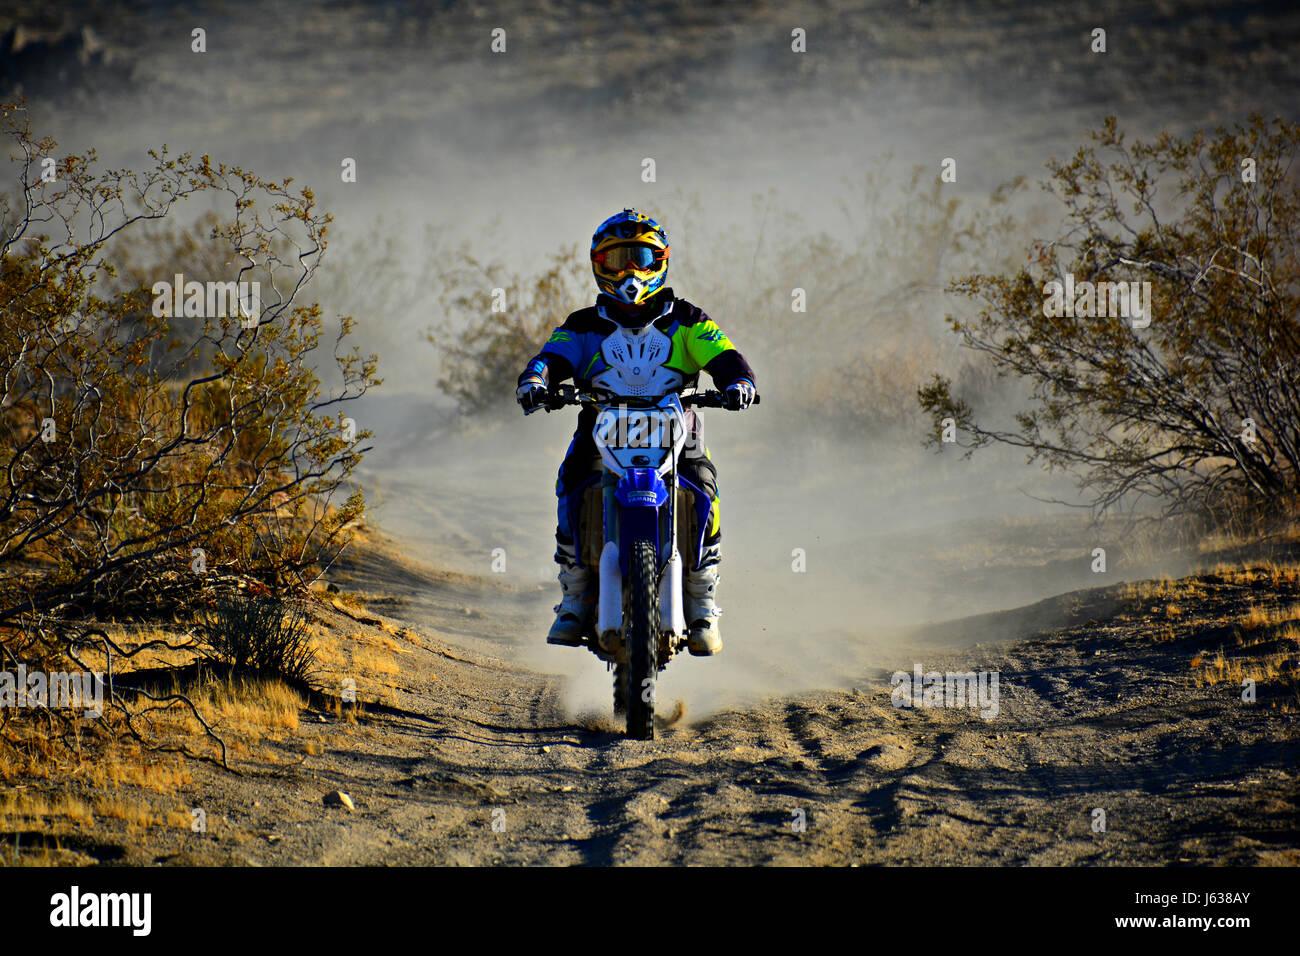 Dirt bike in a cloud of dust speeding through the desert. - Stock Image